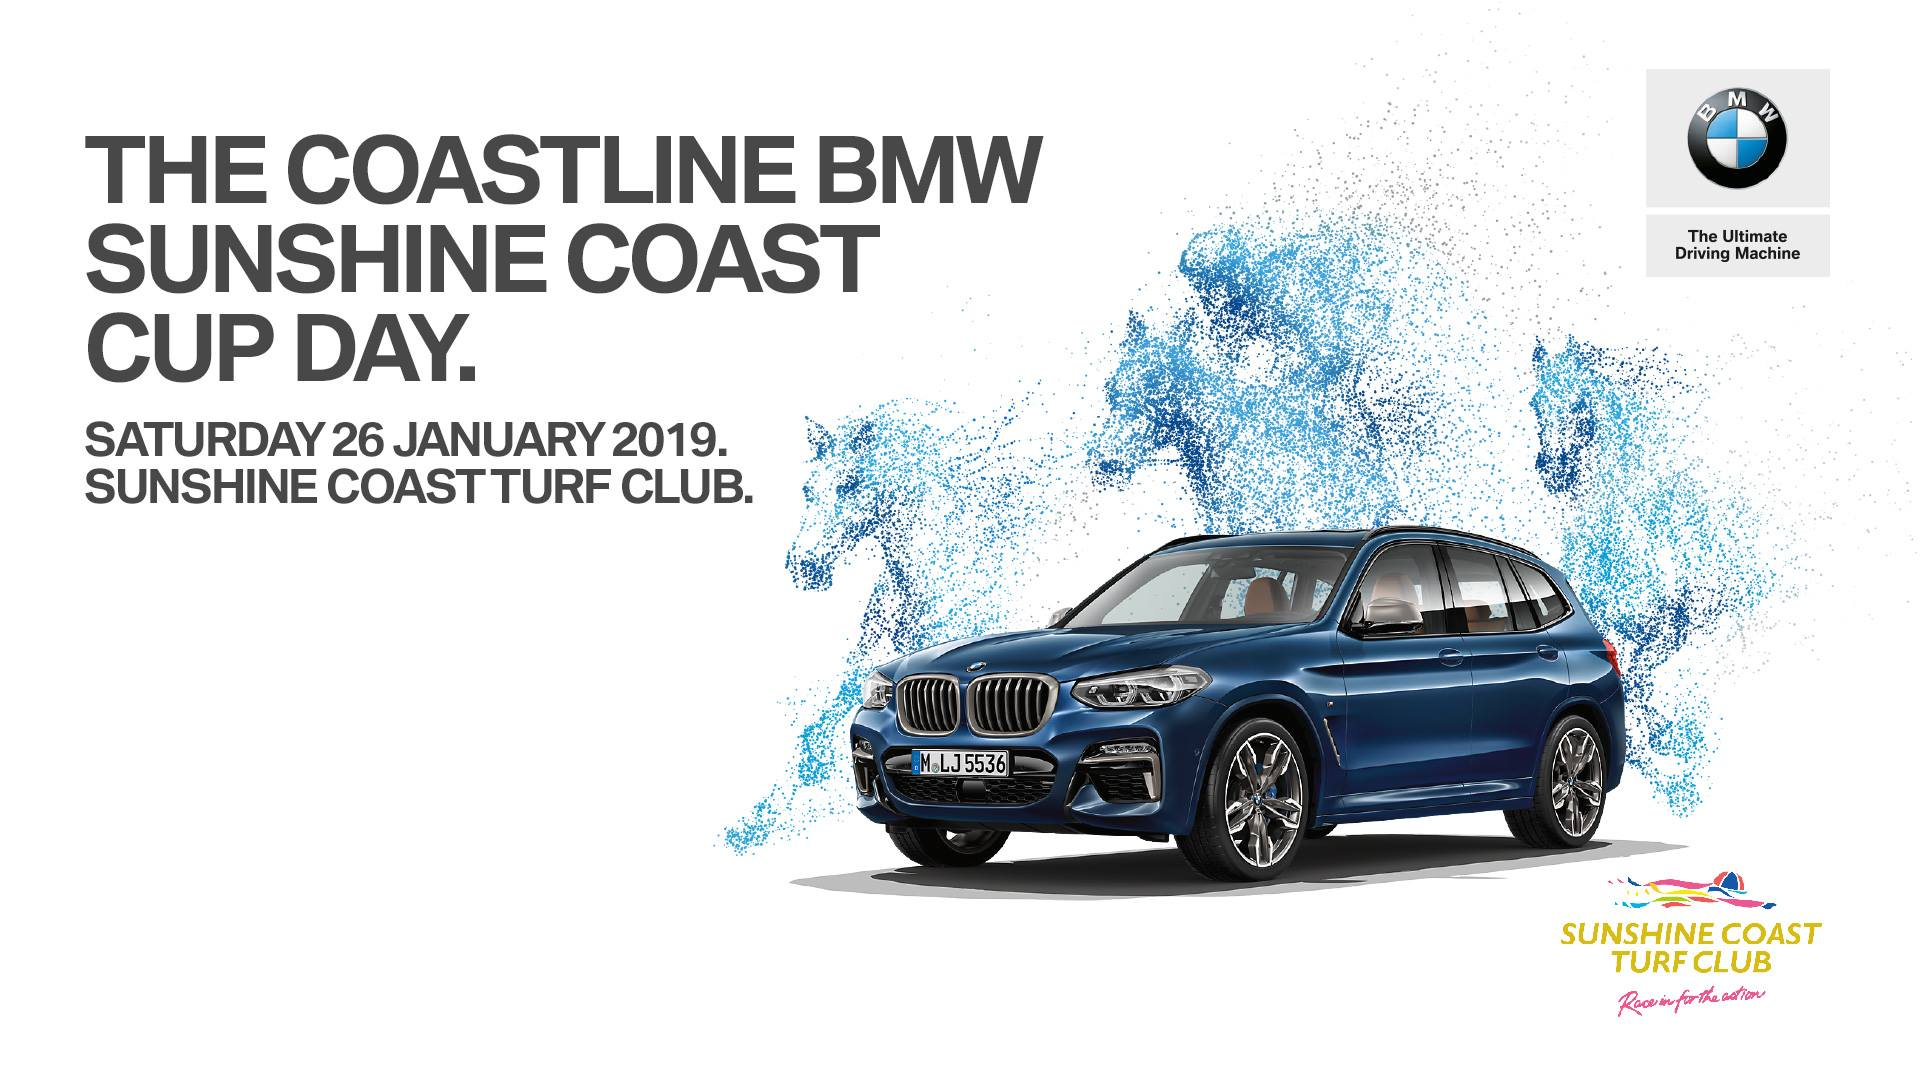 Sunshine Coast Turf Club Coastline BMW